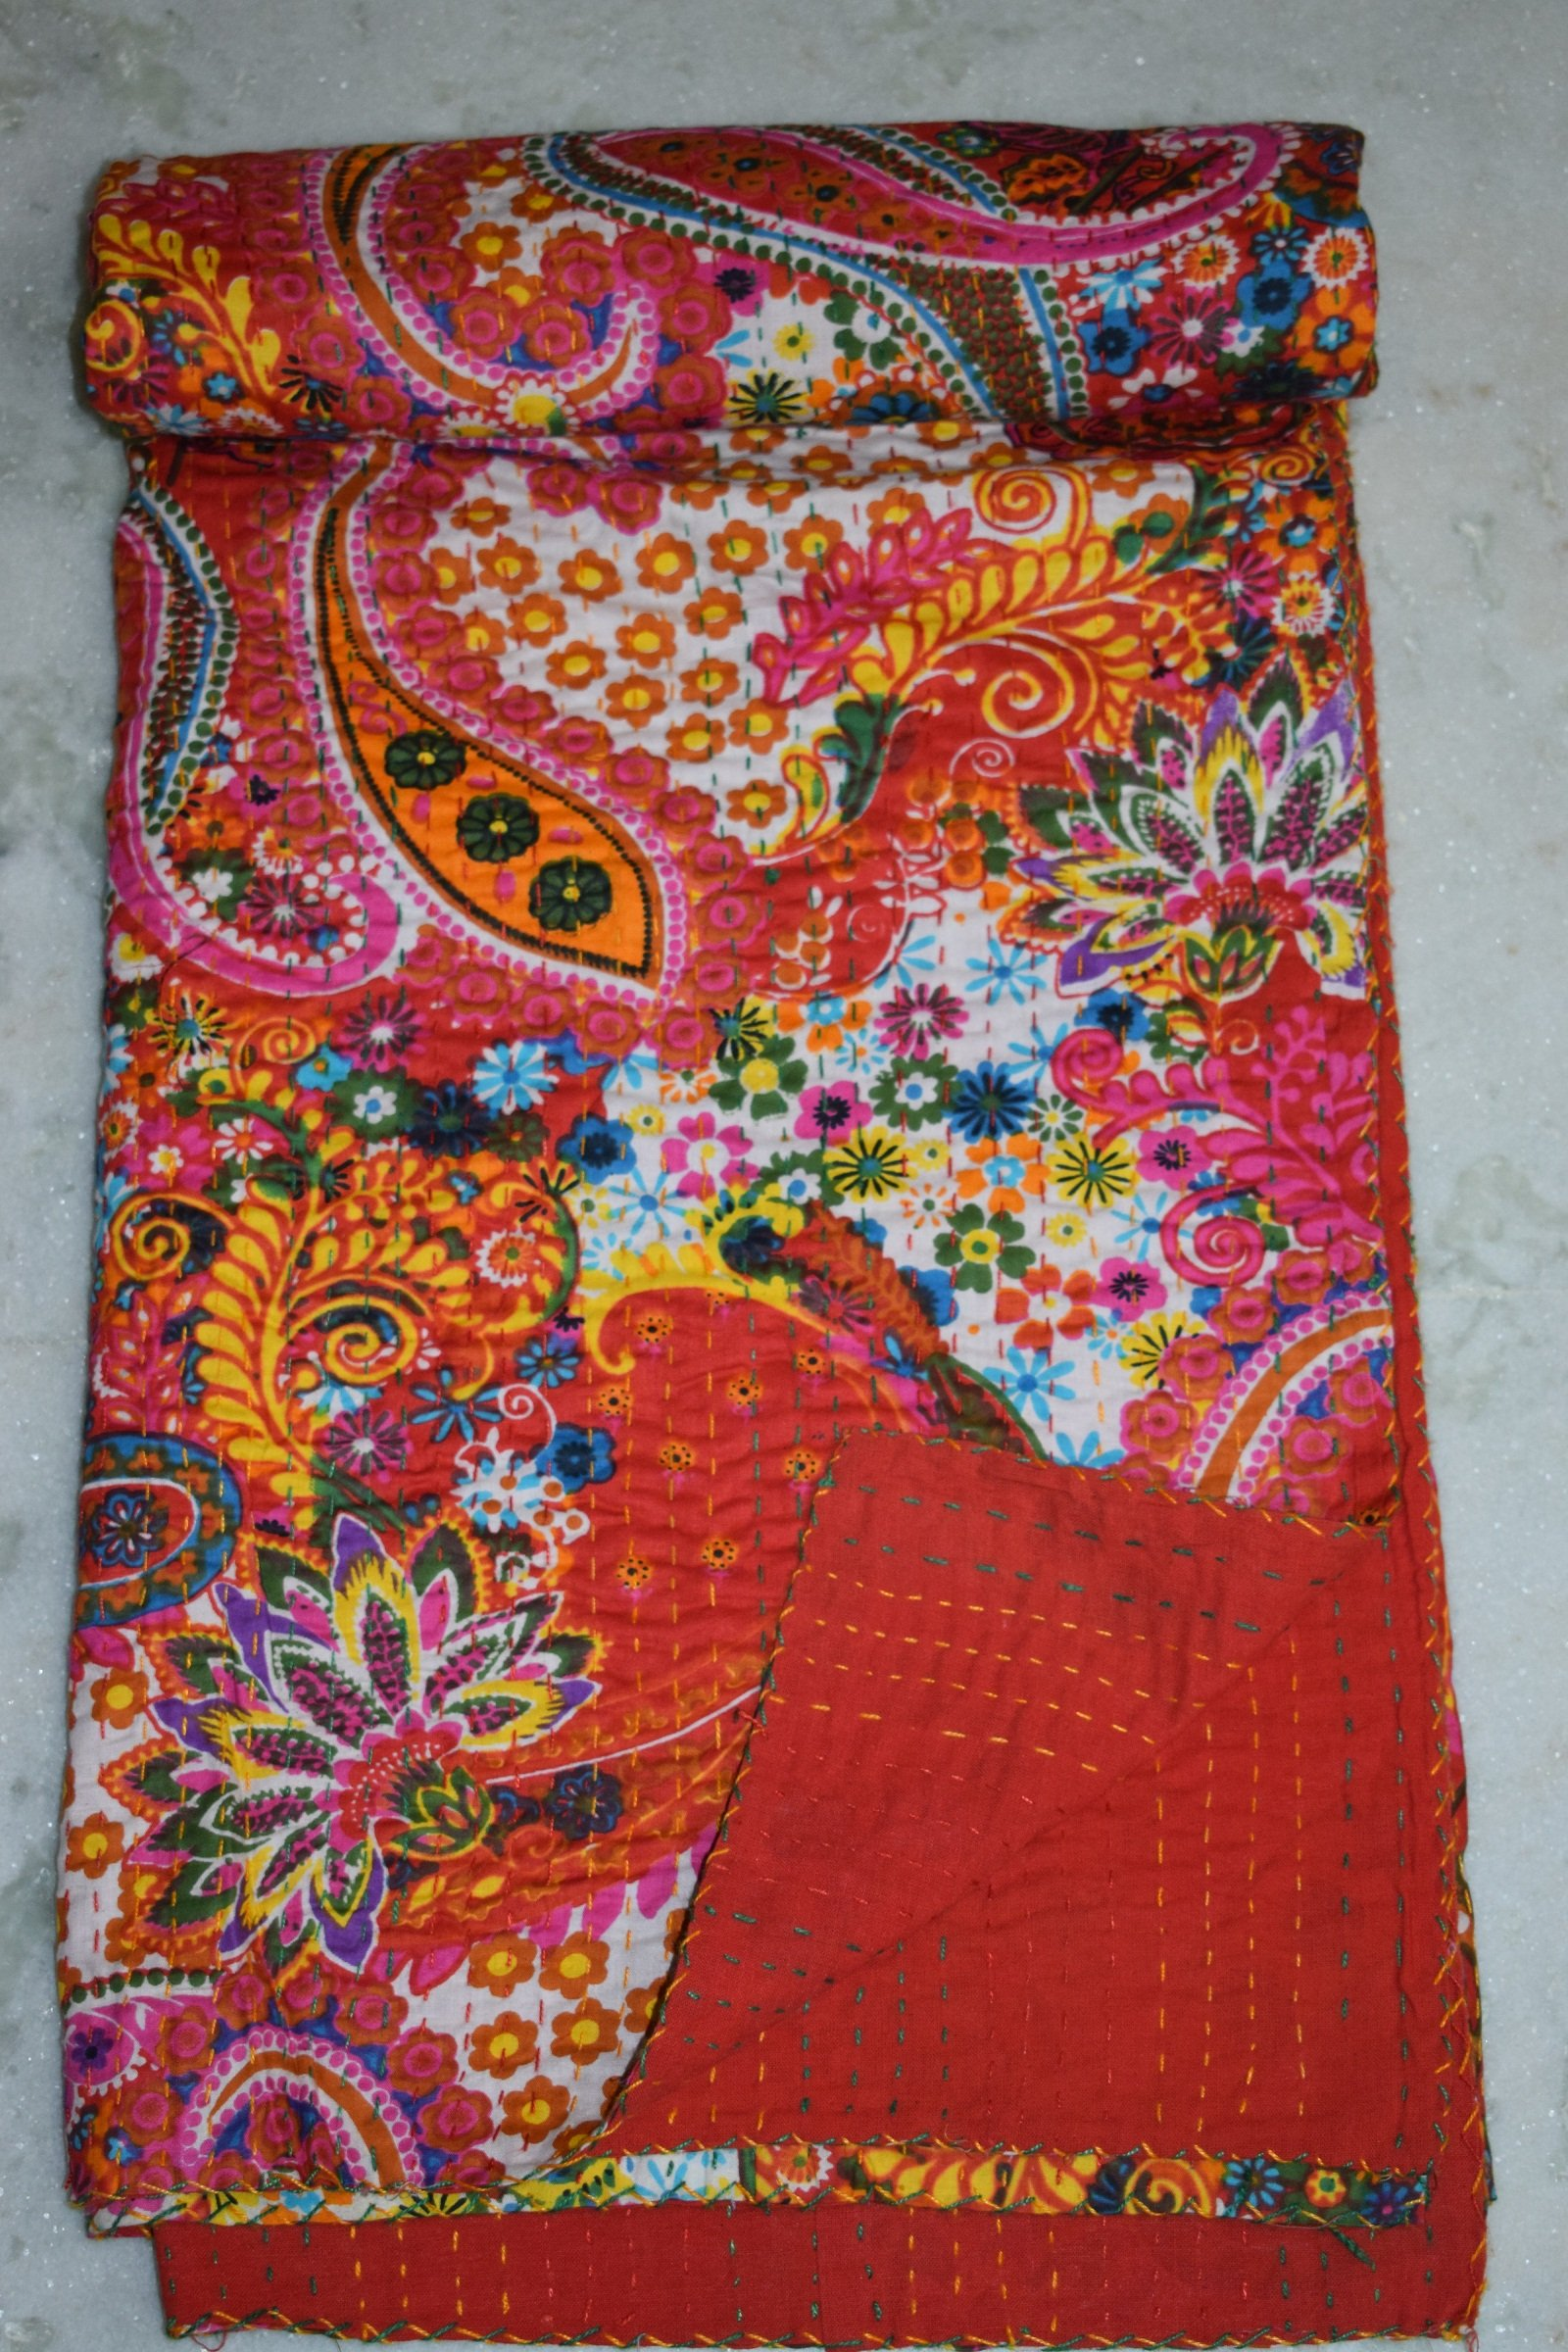 Tribal Asian Textiles Traditioanl India Cotton Twin Blanket, Kantha Reversible Quilt , Wedding Kantha Quilt Vintage Kantha Throw Bedroom Beddiing Floral Gudri Ralli Bedspreads Kantha Quilt